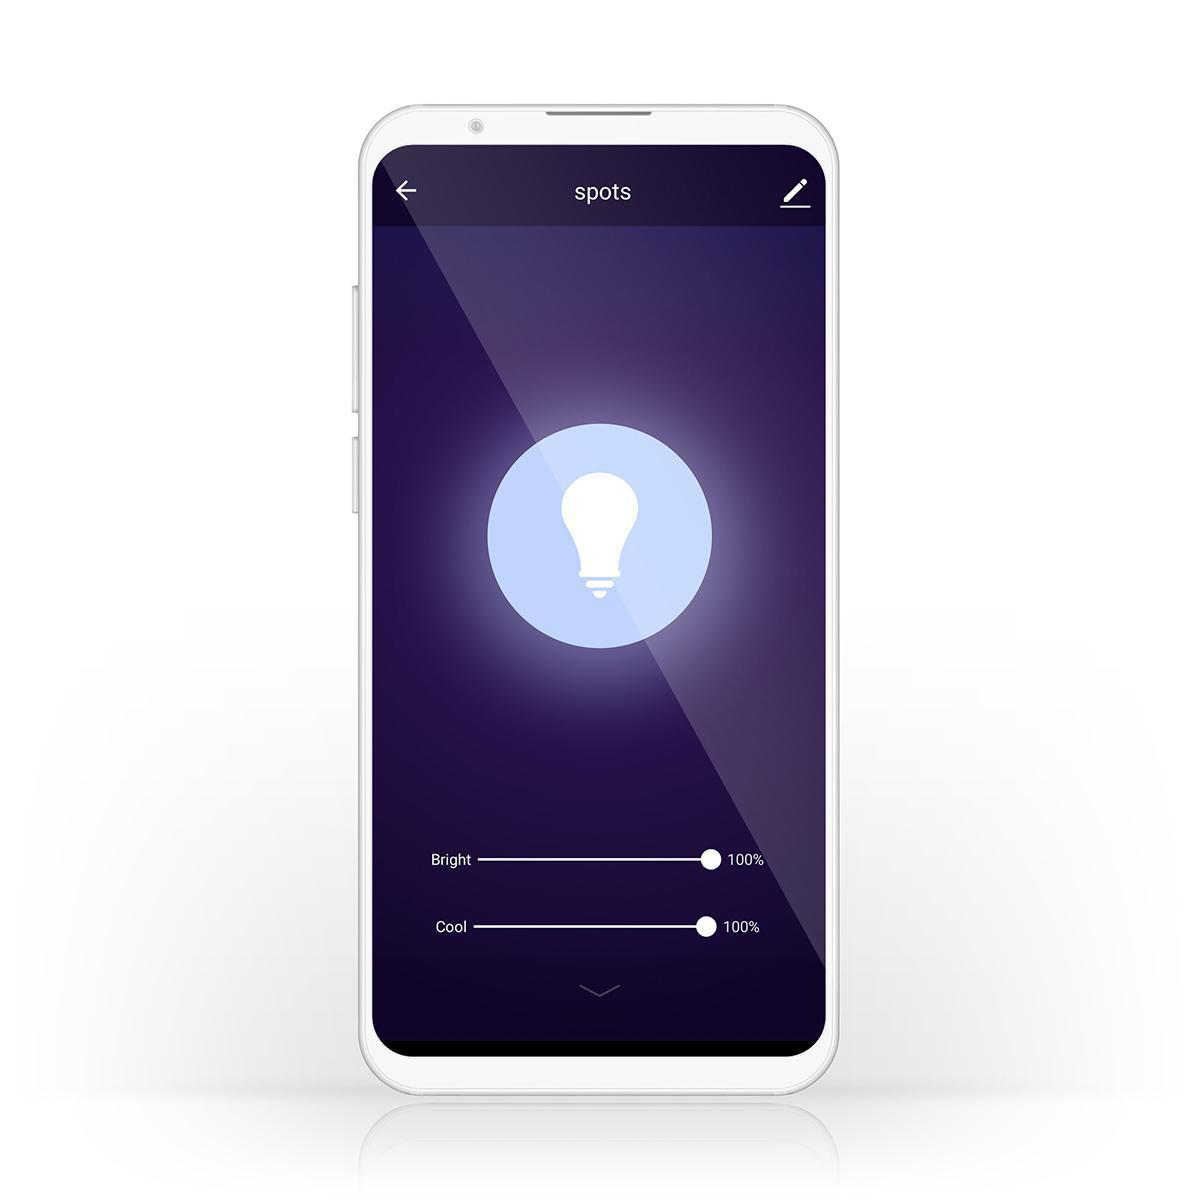 Slimme Led Edison Lamp met wifi E27 fitting 1800K - 6500K - bediening app